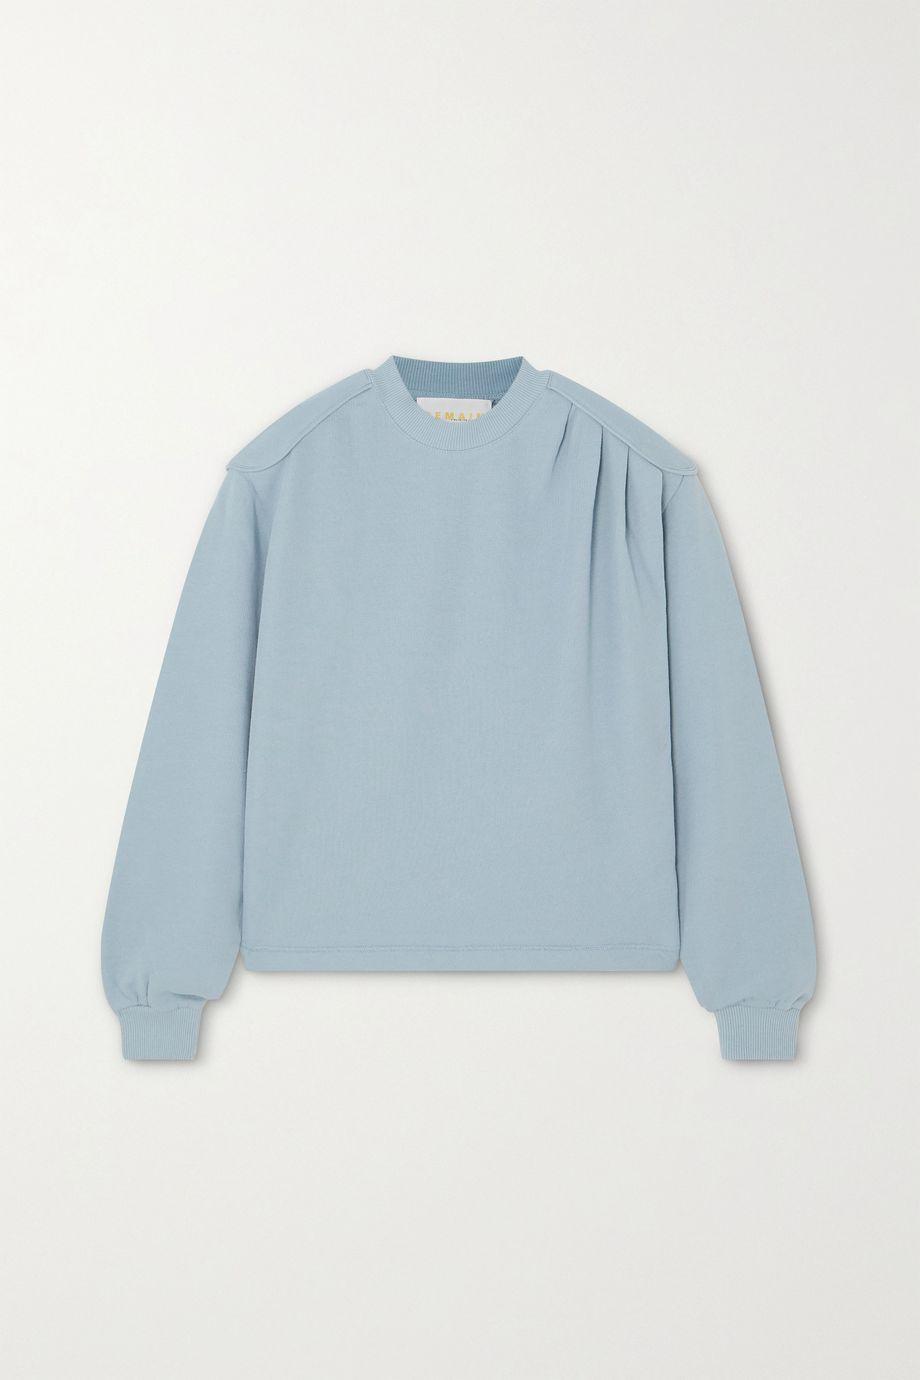 REMAIN Birger Christensen Rimini gathered cotton-jersey sweatshirt